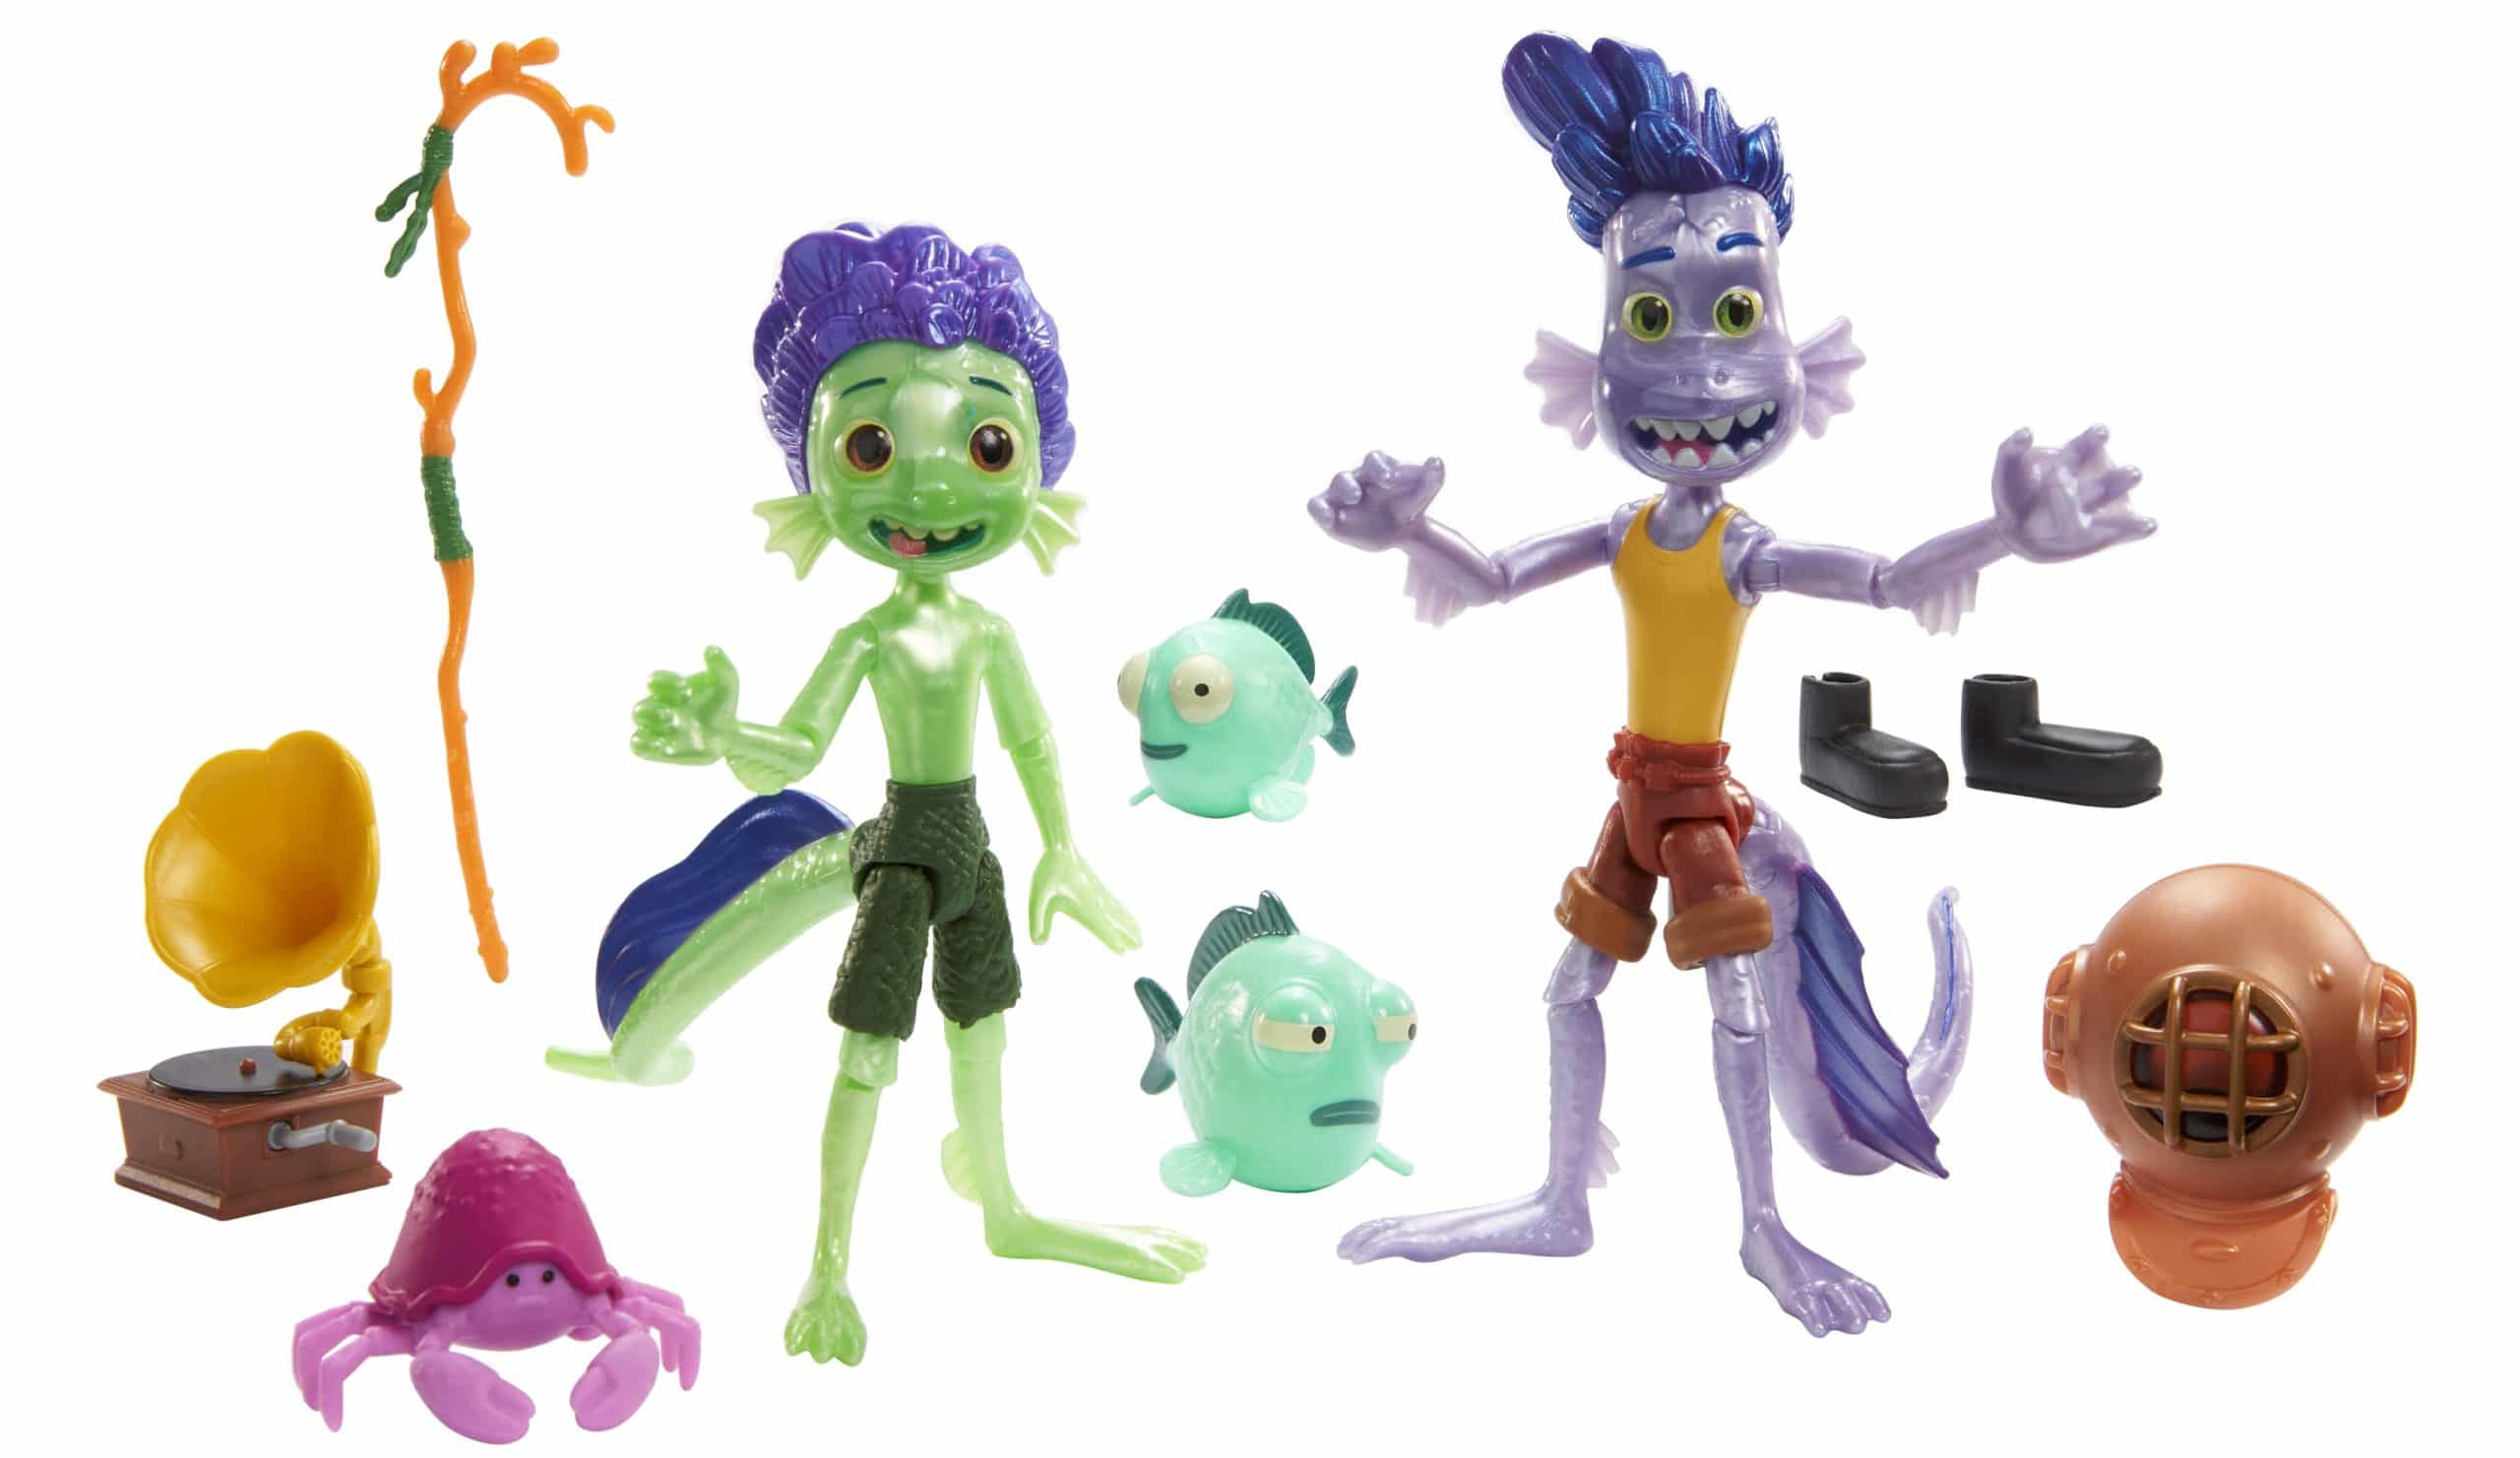 Mattel unveils Luca action figures ahead of the film's Disney+ premiere 16